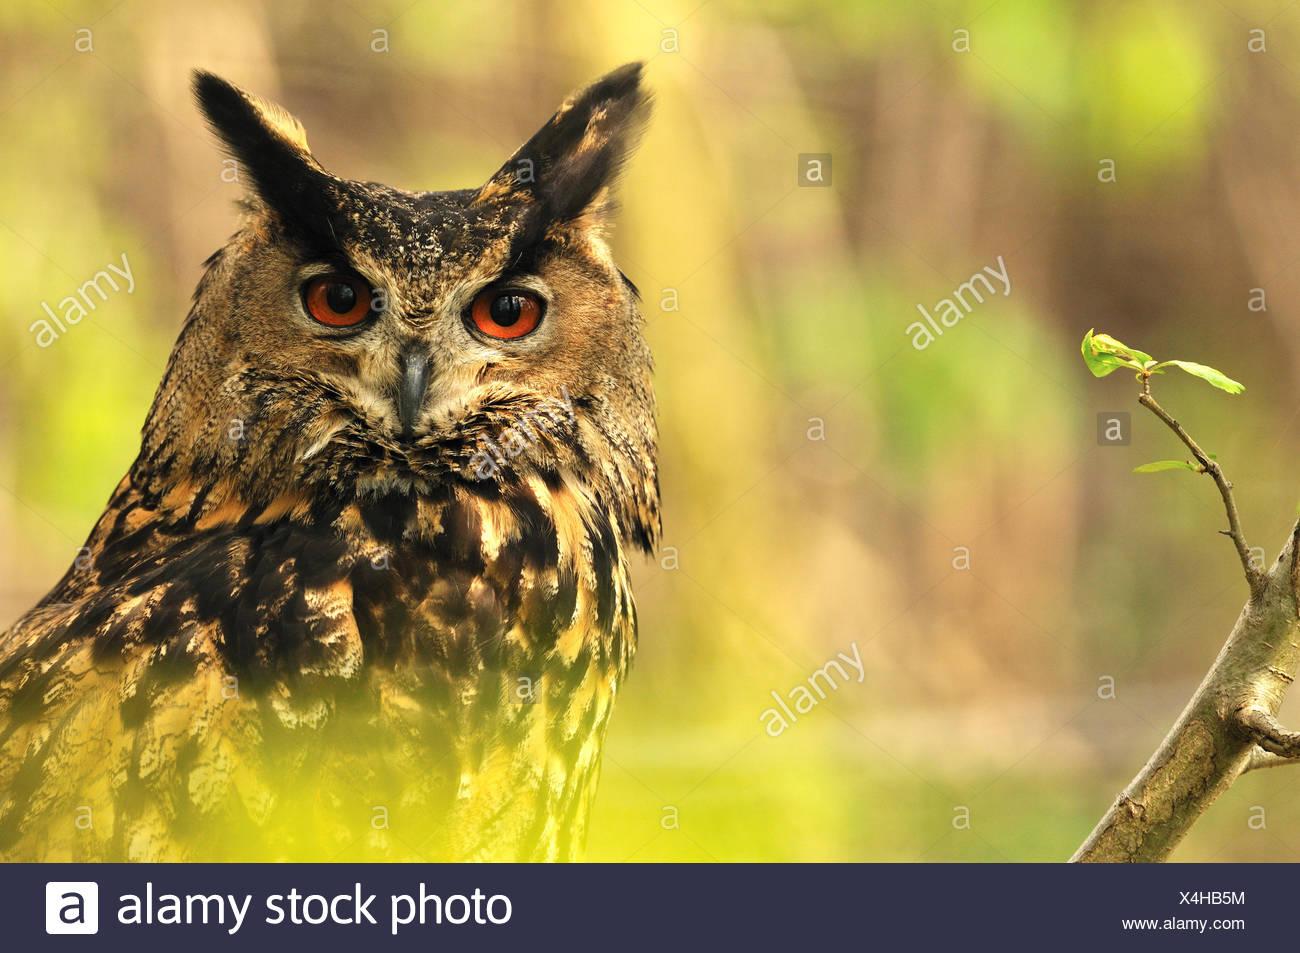 Uhu Bubo Bubo Eule Eulen Nacht Vogel der Raubvögel Greifvogel Vogel peering Frühling Raptor Ohren Pinsel Ohren Nacht hu Stockbild